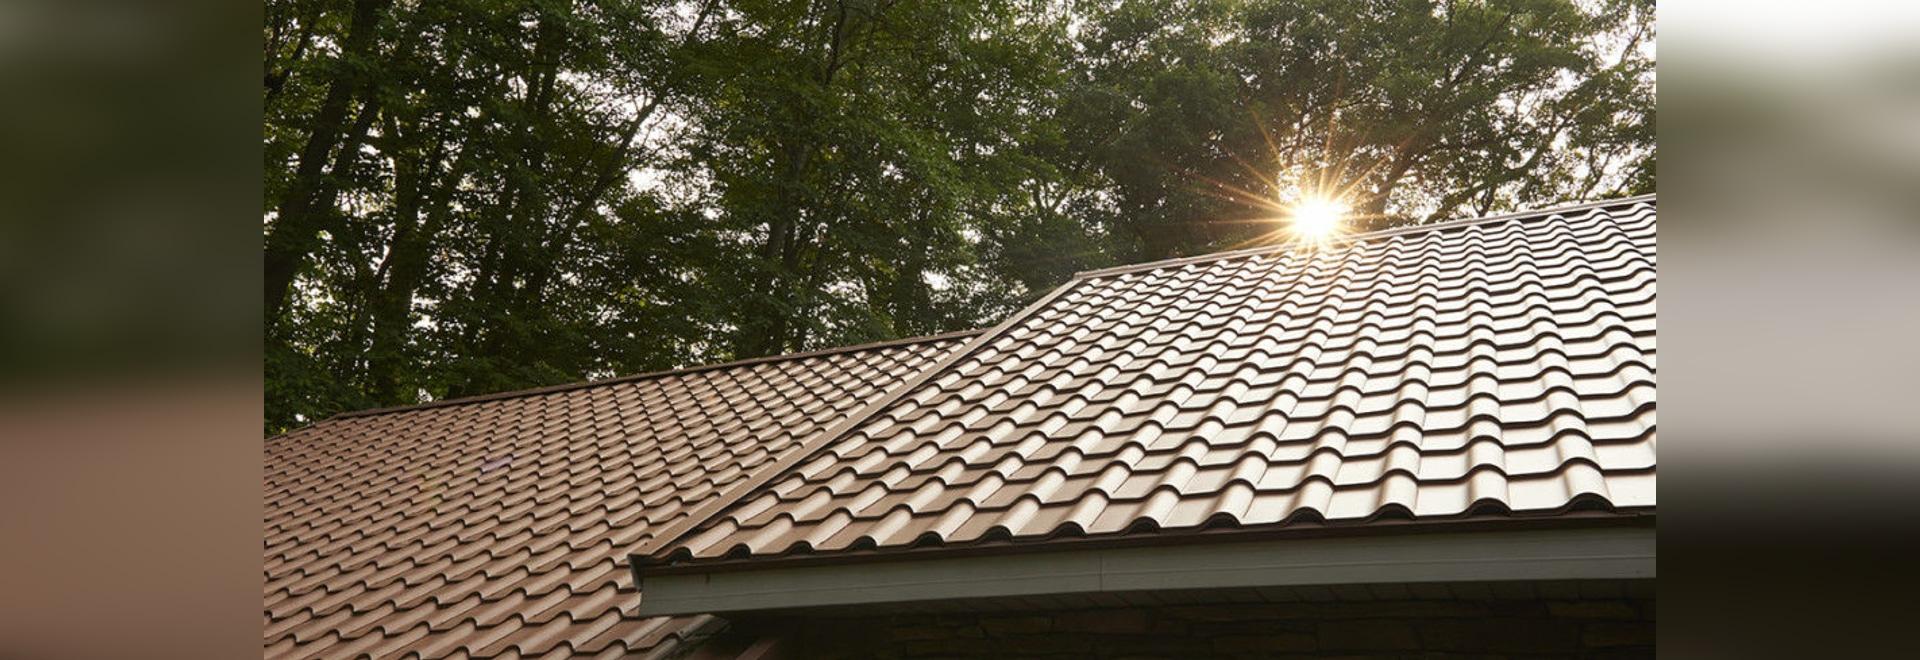 NEW: metal roof tile by MATTERHORN METAL ROOFING